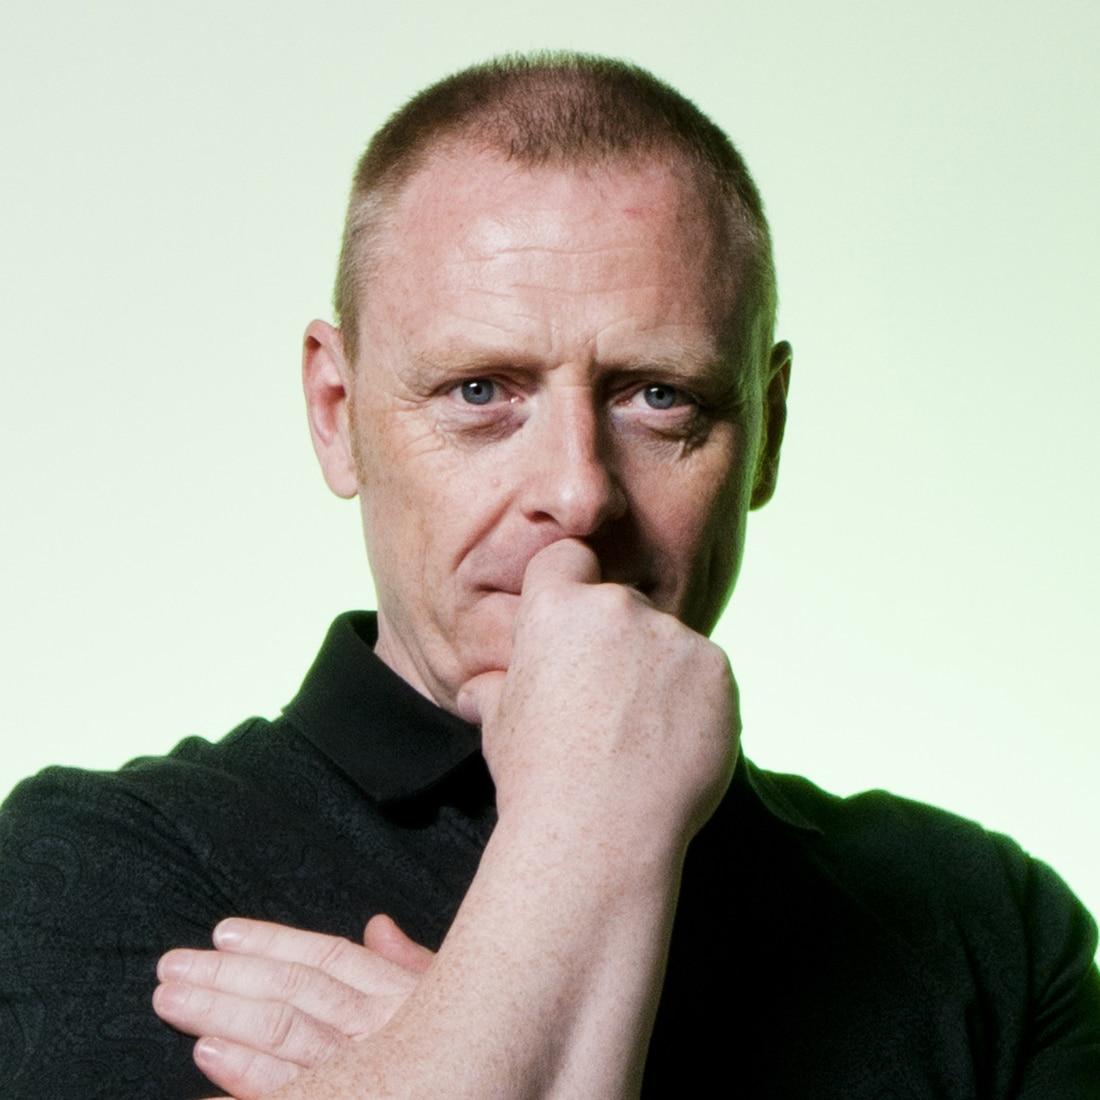 David Thomas - Motivational Memory Speaker at Great British Speakers